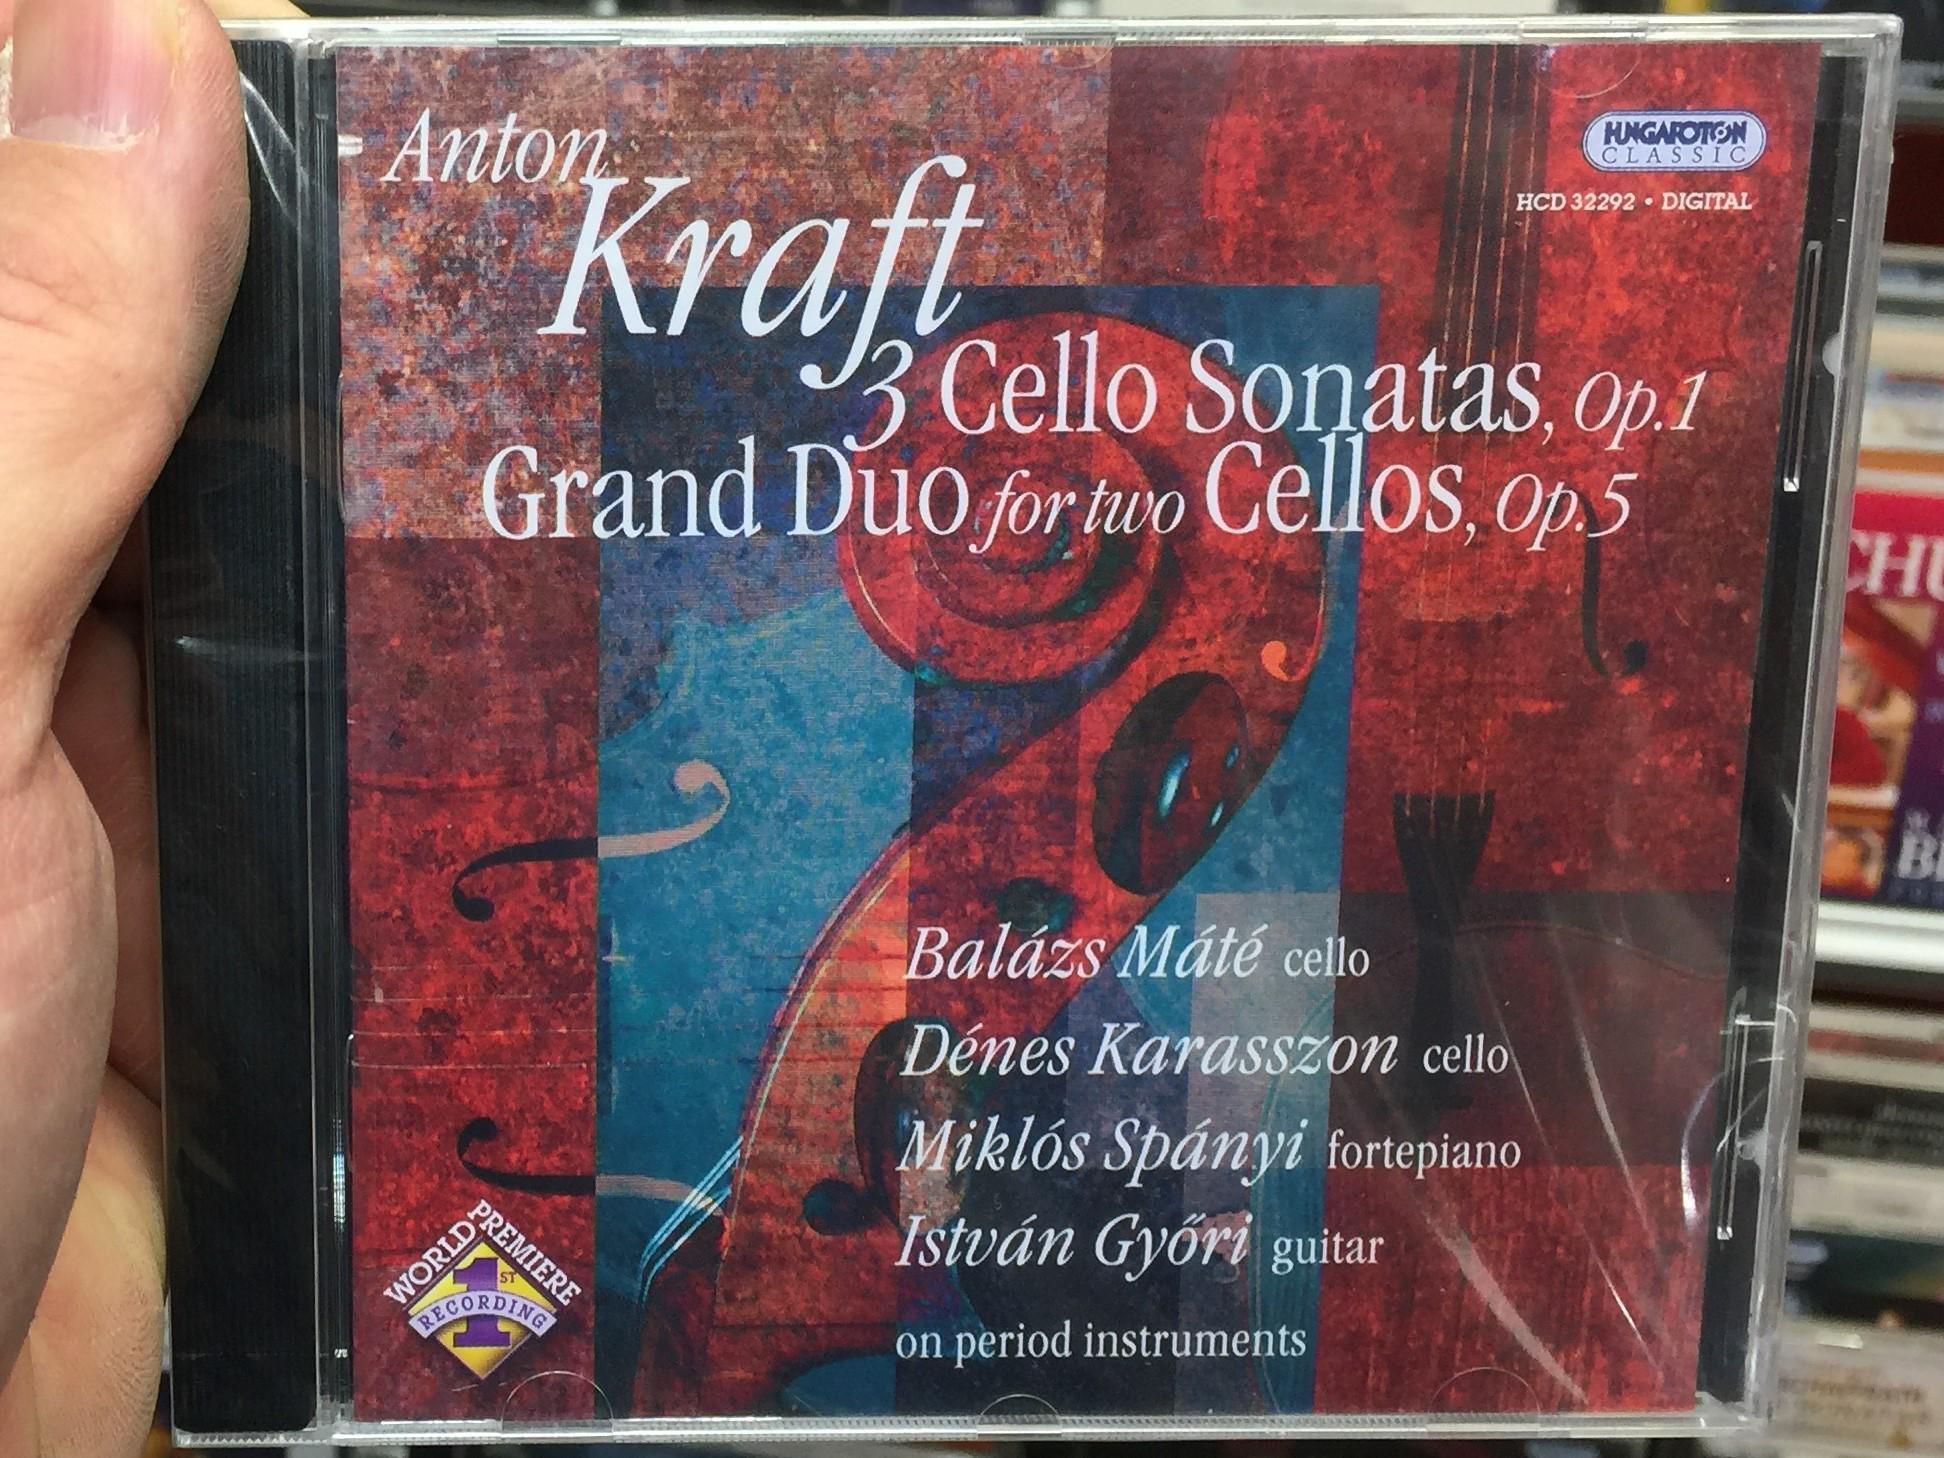 anton-kraft-3-cello-sonatas-op.-1-grand-duo-for-two-cellos-op.-5-balazs-mate-cello-denes-karasszon-cello-miklos-spanyi-fortepiano-istvan-gyori-guitar-hungaroton-classic-audio-cd-2-1-.jpg